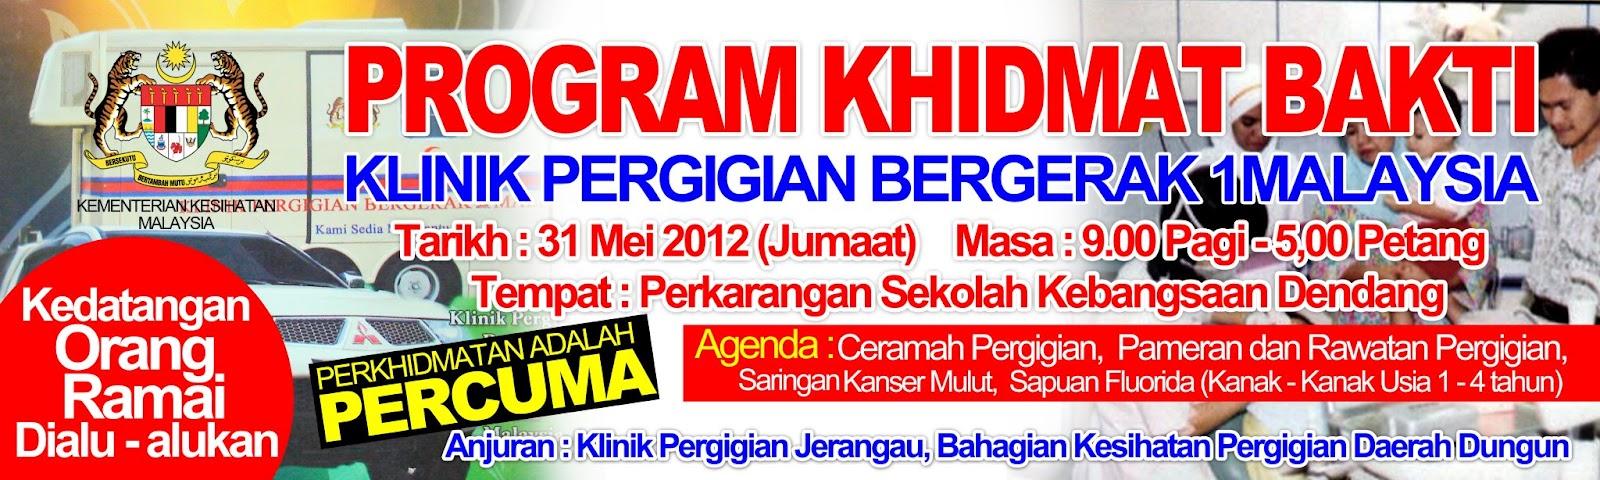 Program Klinik Bergerak 1Malaysia